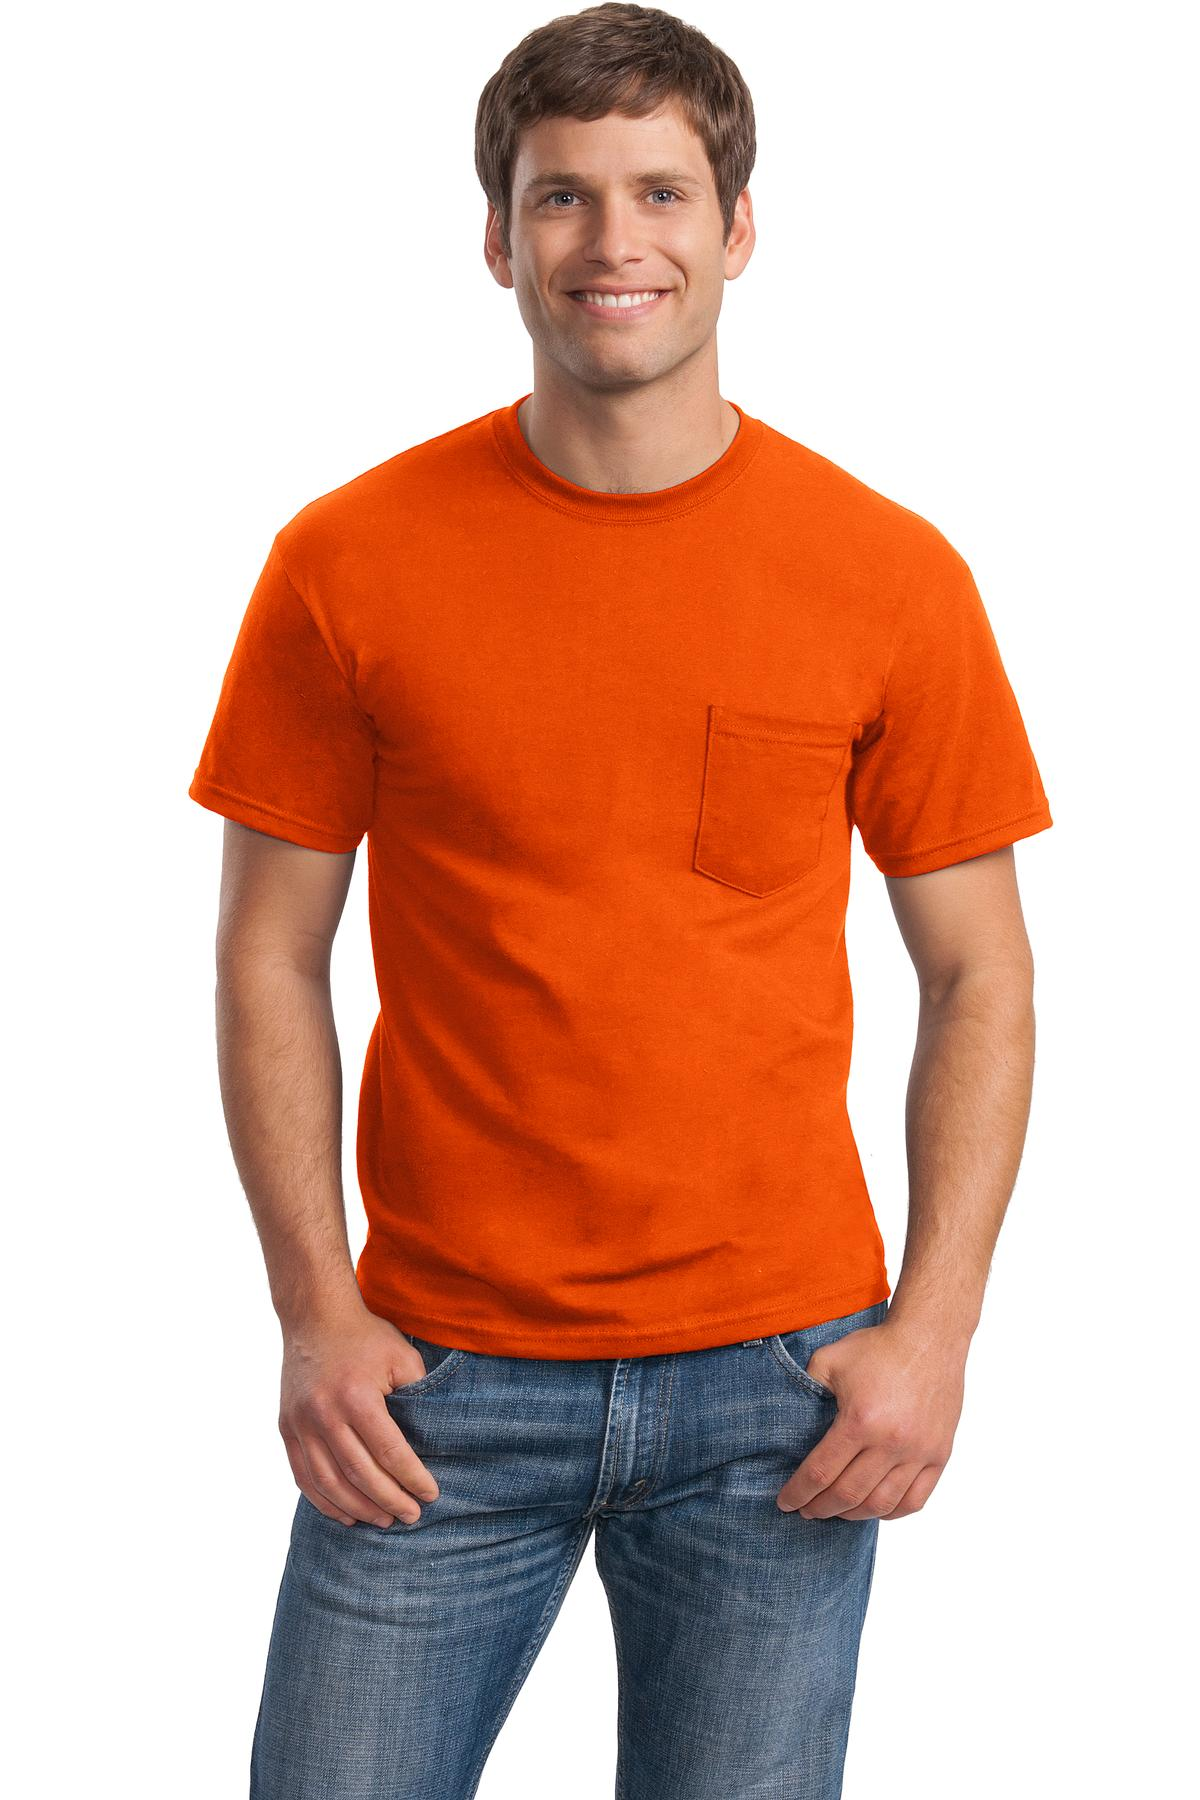 Gildan dryblend 50 cotton 50 poly pocket t shirt 8300 for Poly blend t shirts wholesale